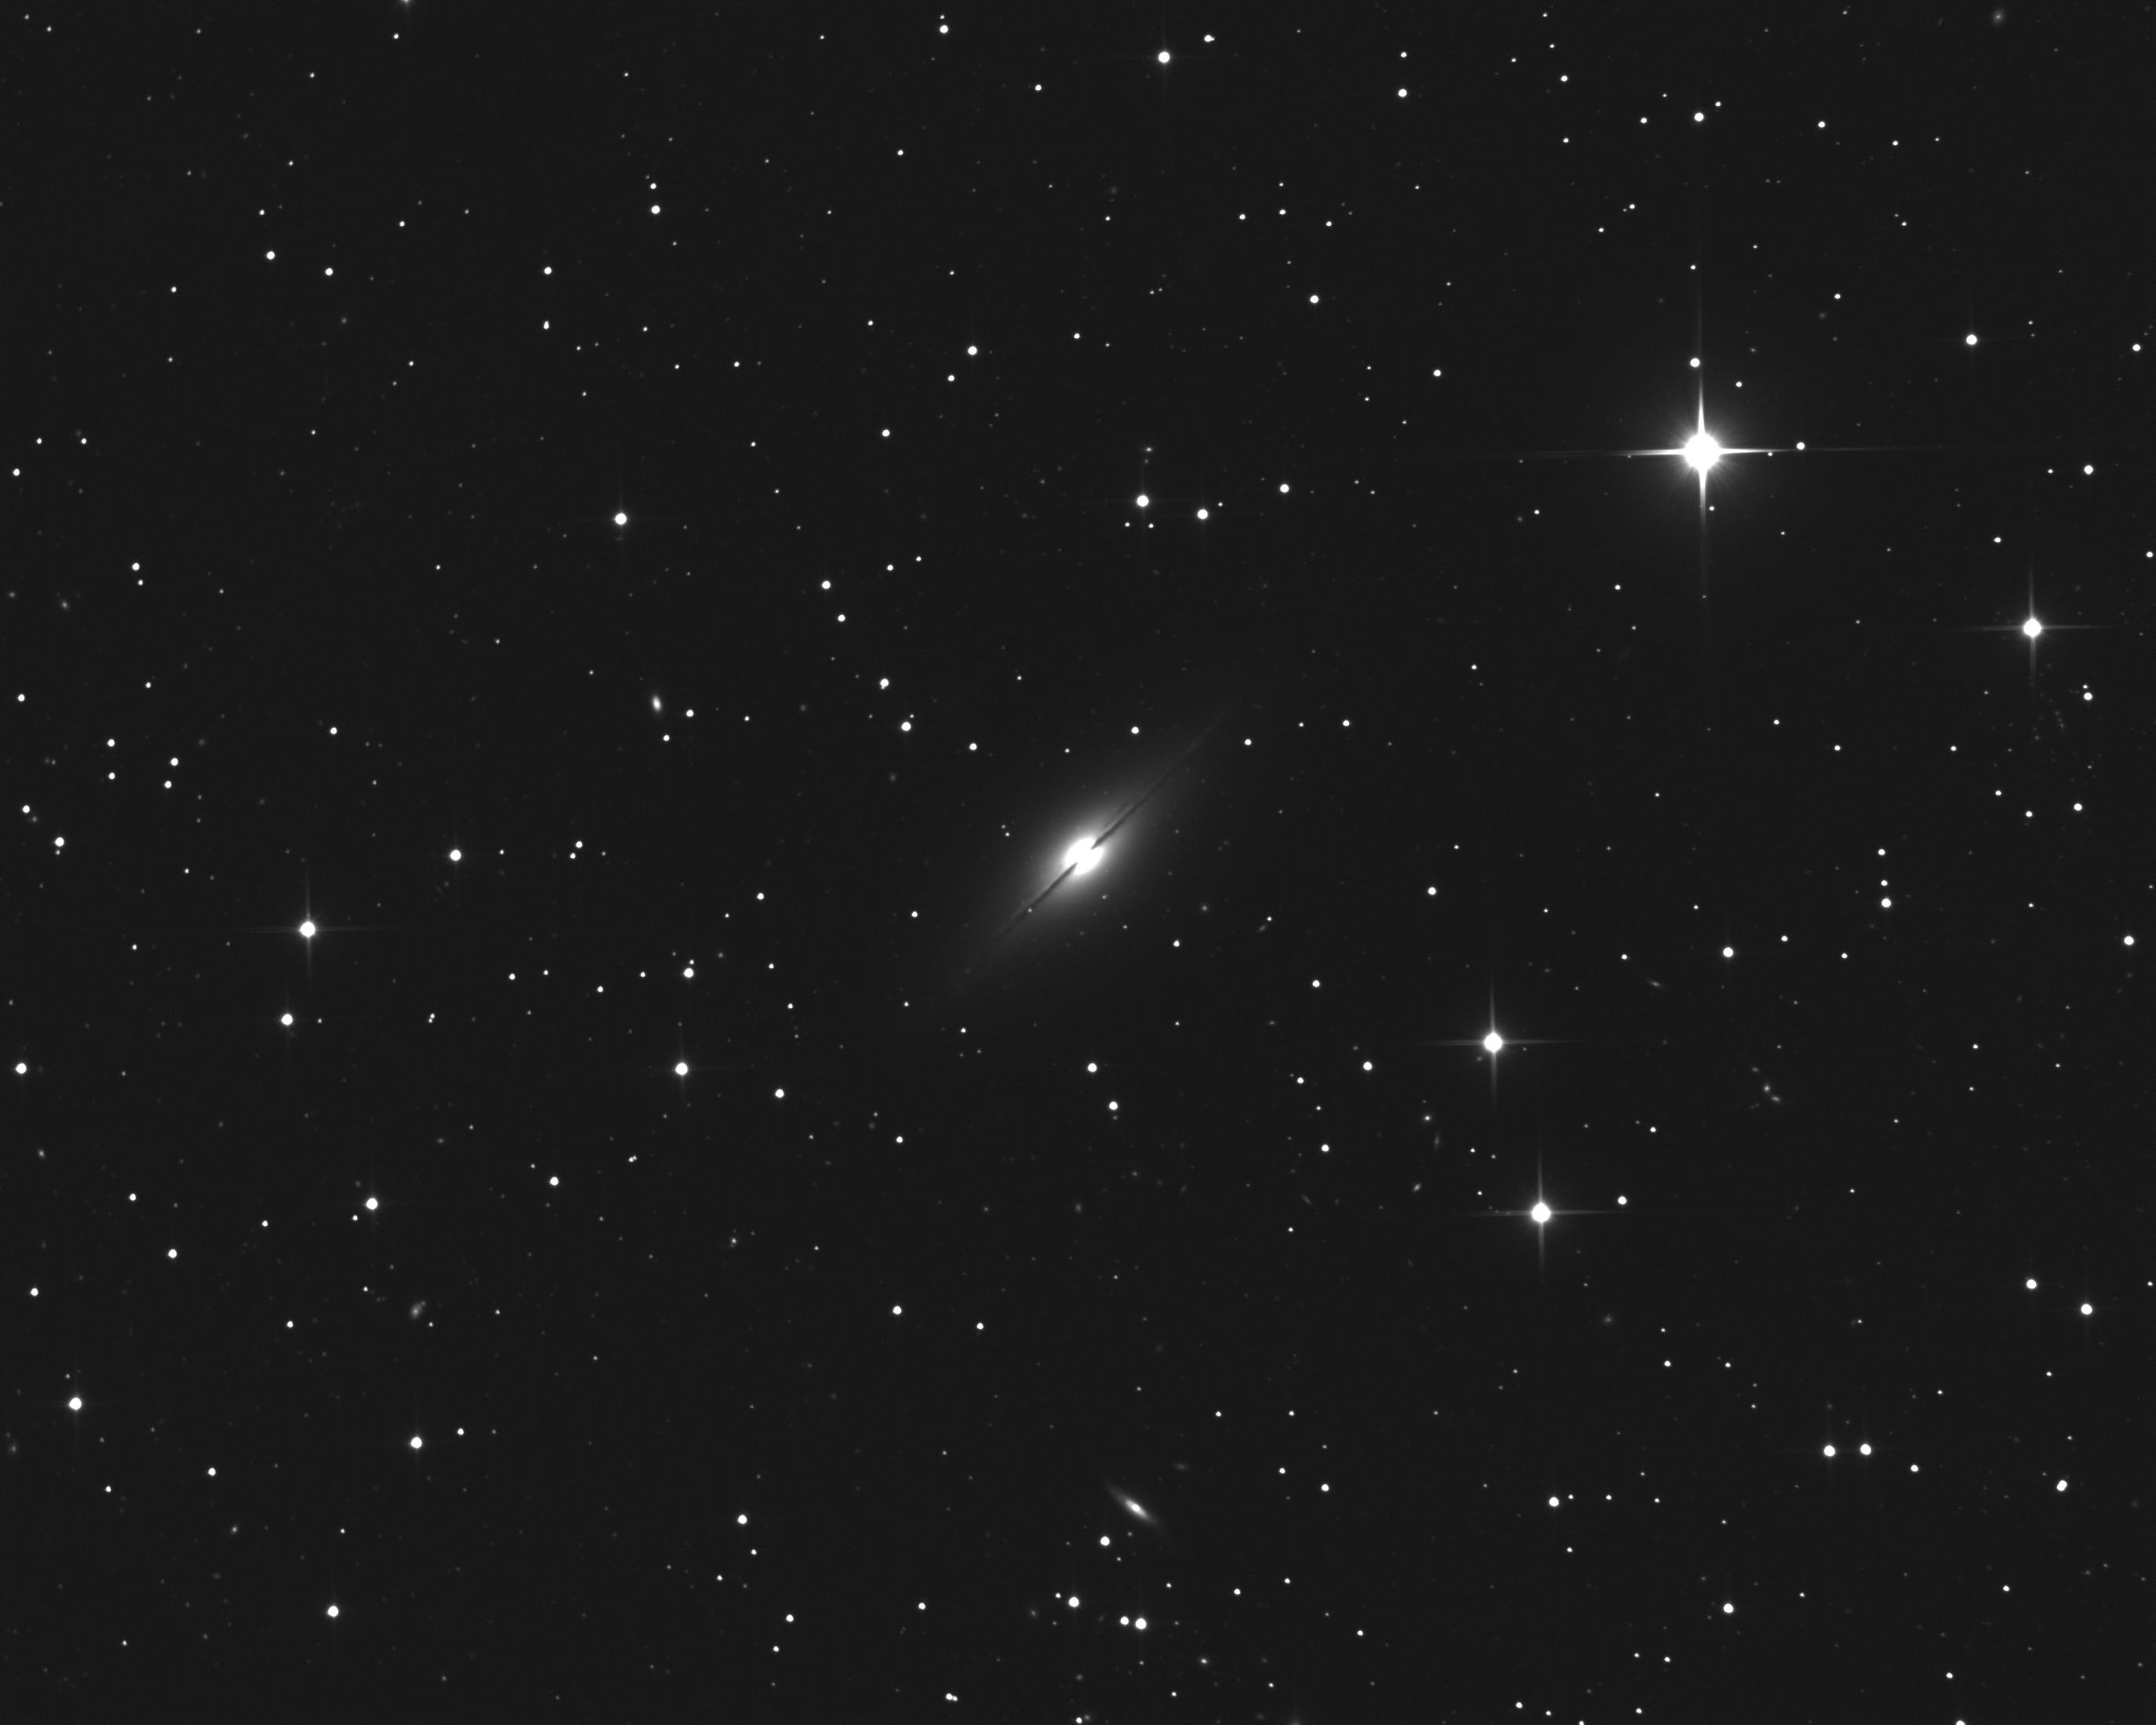 Supernova 2021rhu dans la galaxie NGC7814 NGC7814